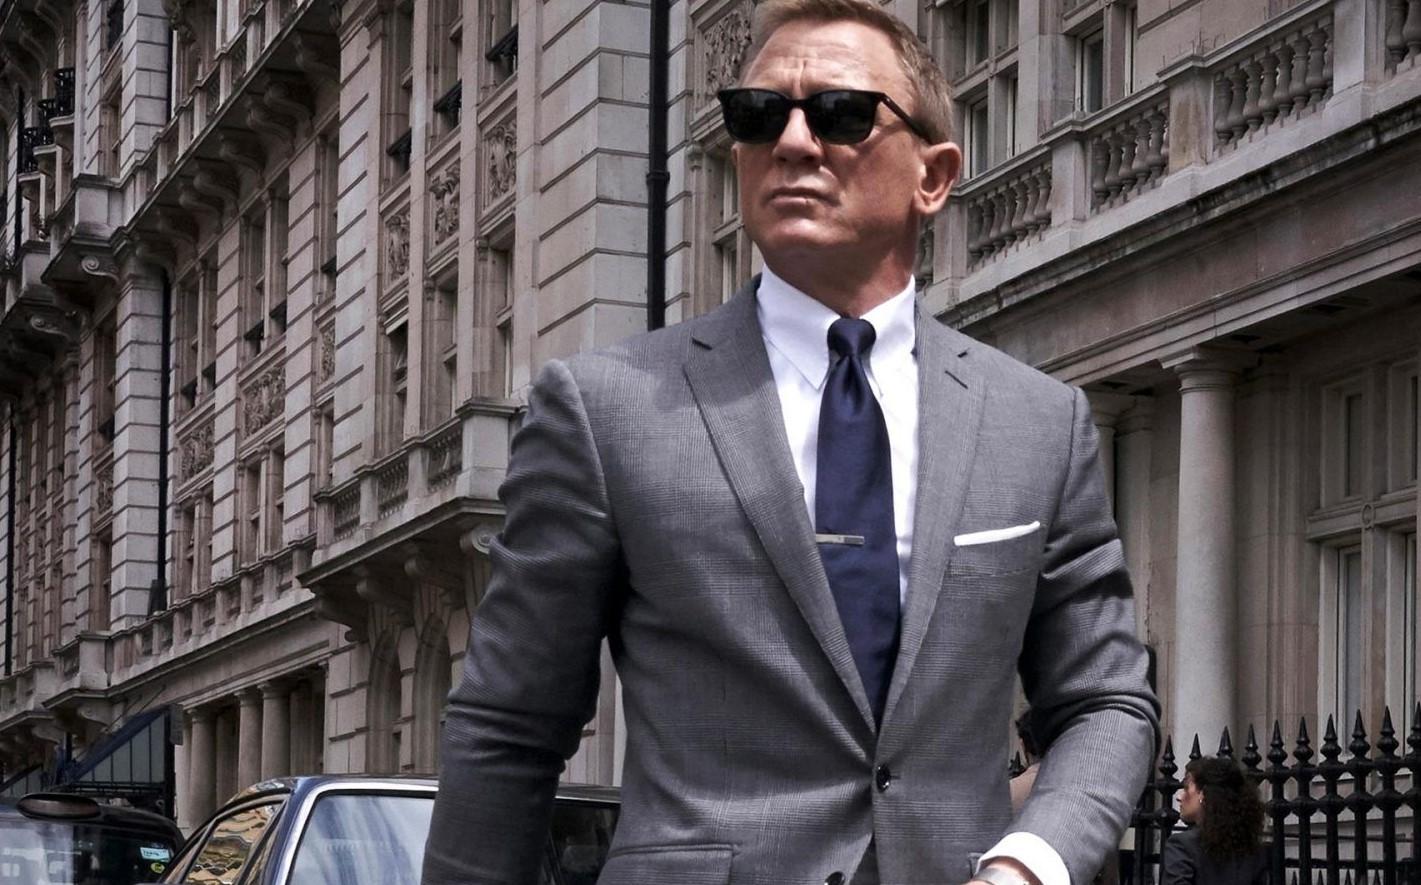 James Bond (007): One Of The Highest Grossing Film Franchises In History.